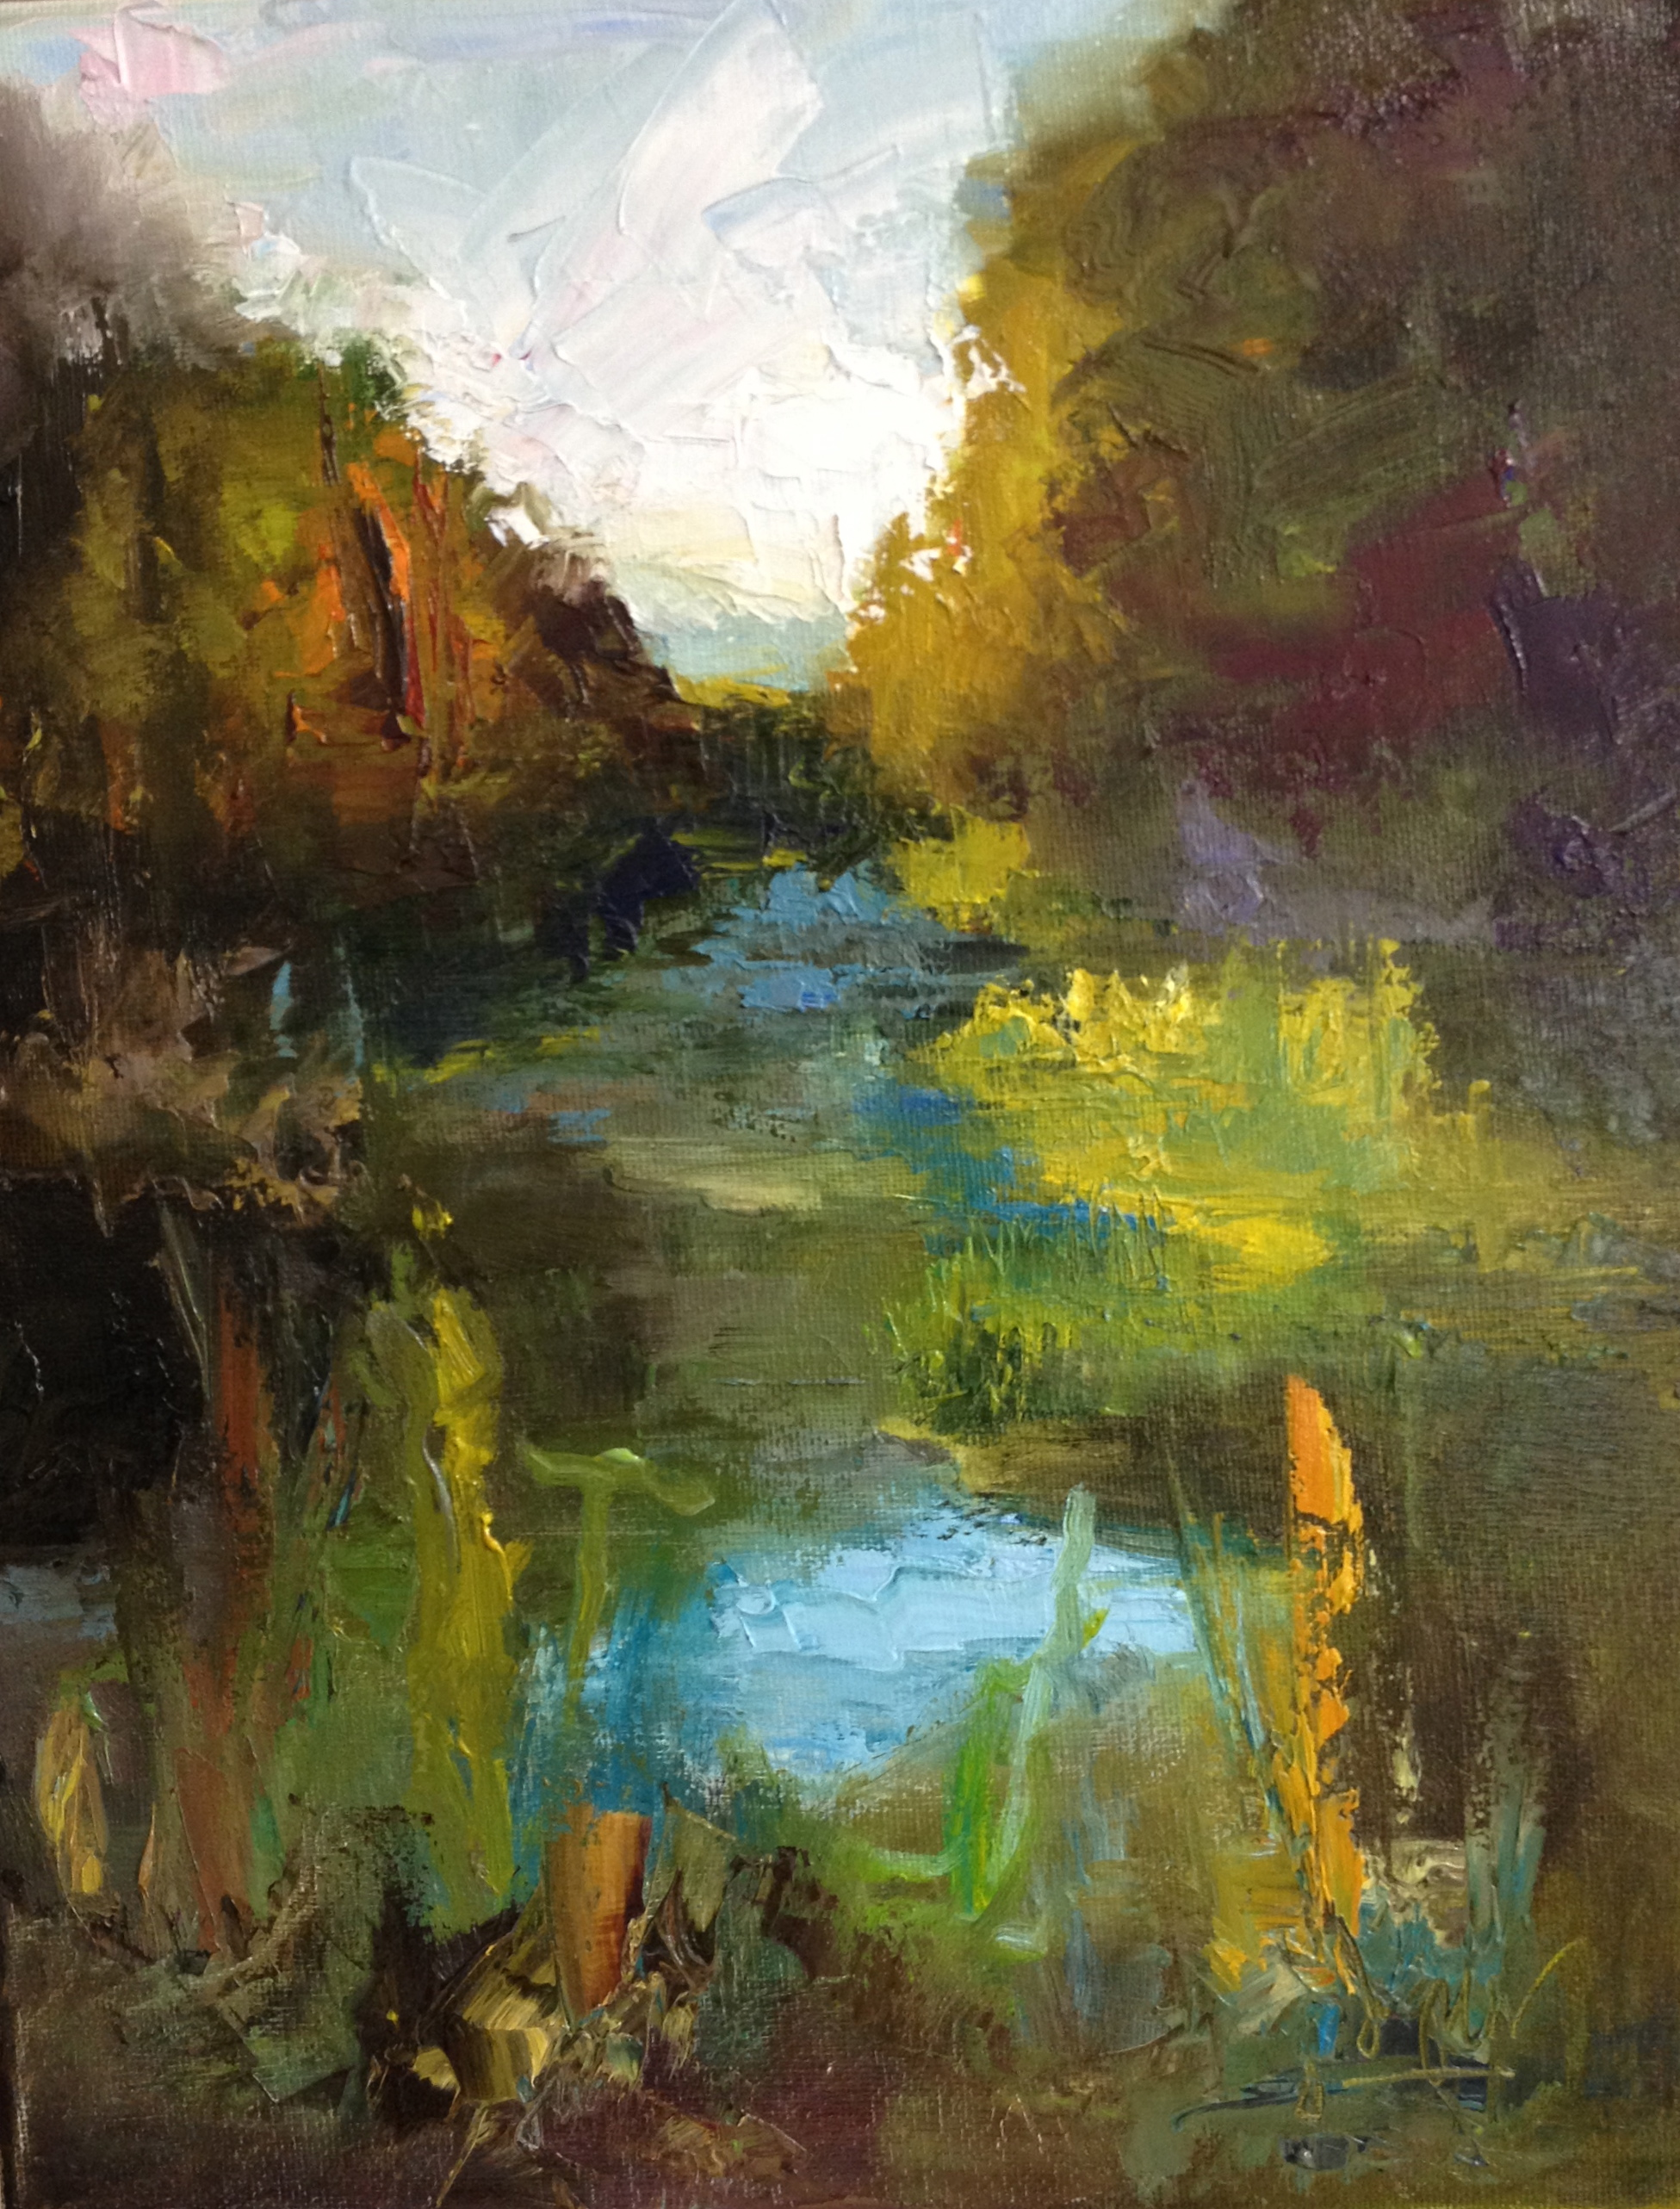 Saxton's River